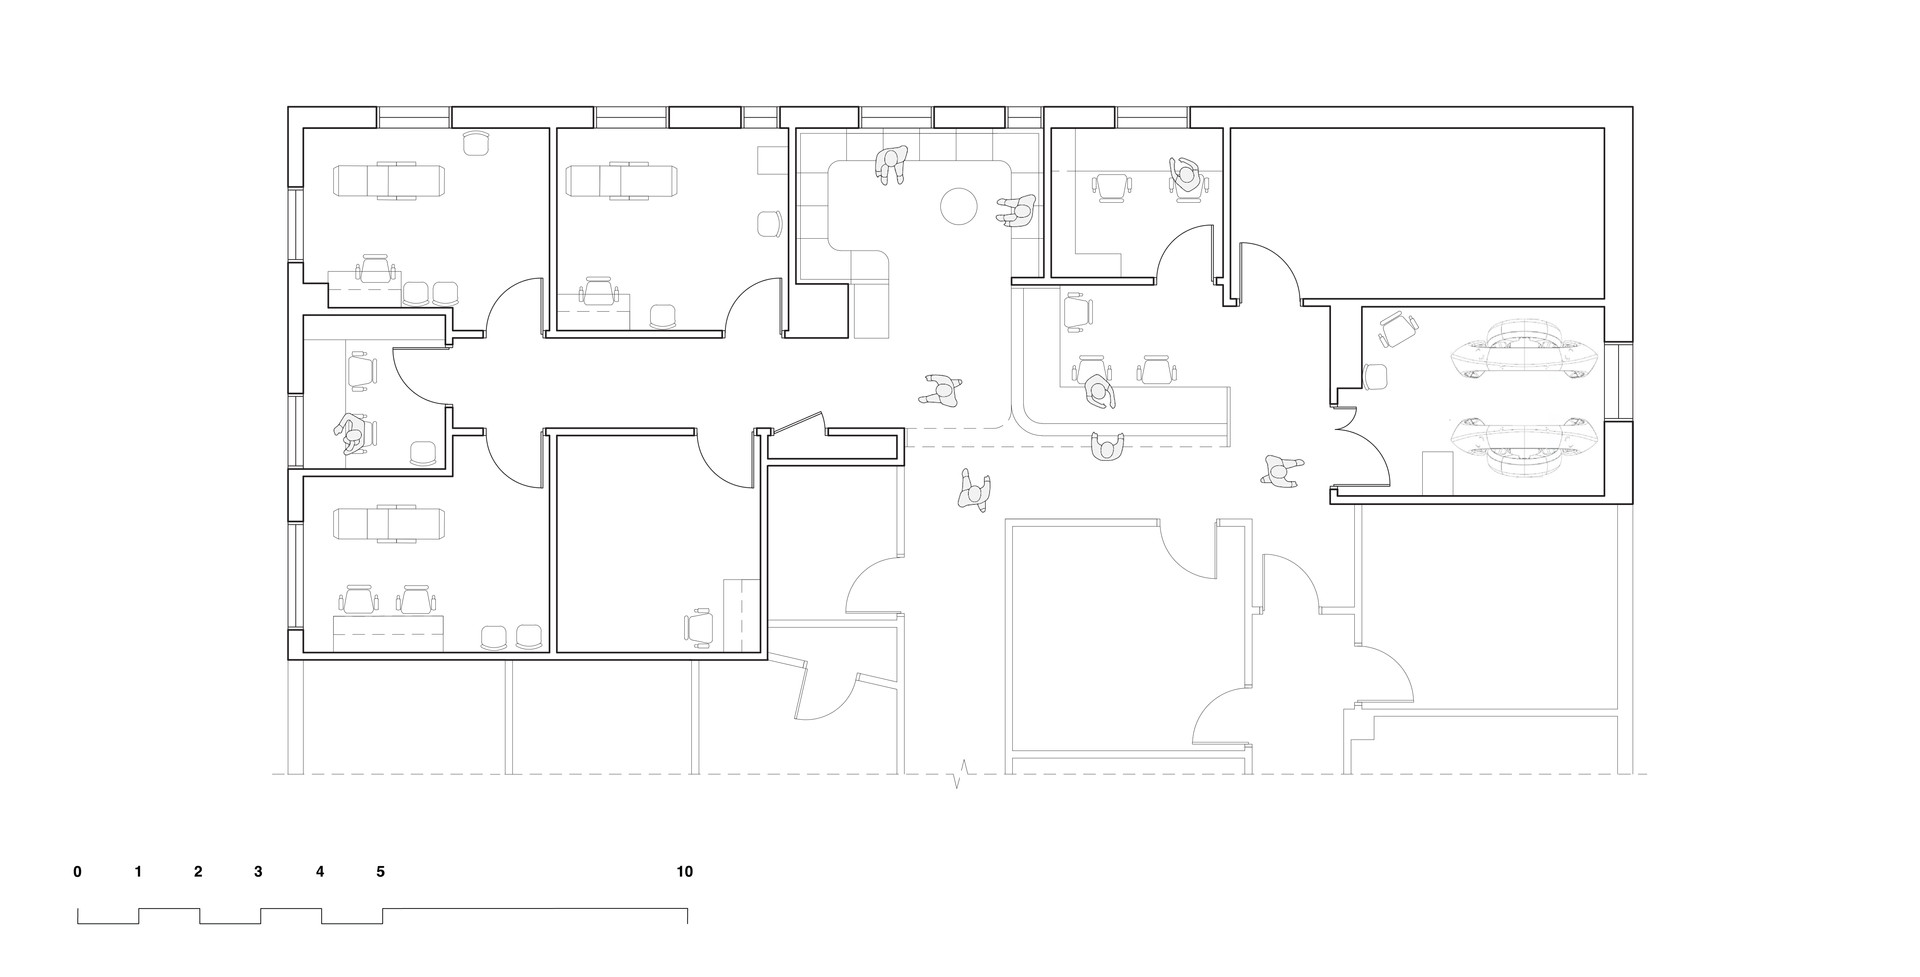 19003_MelanomaInstitute-Plan.jpg